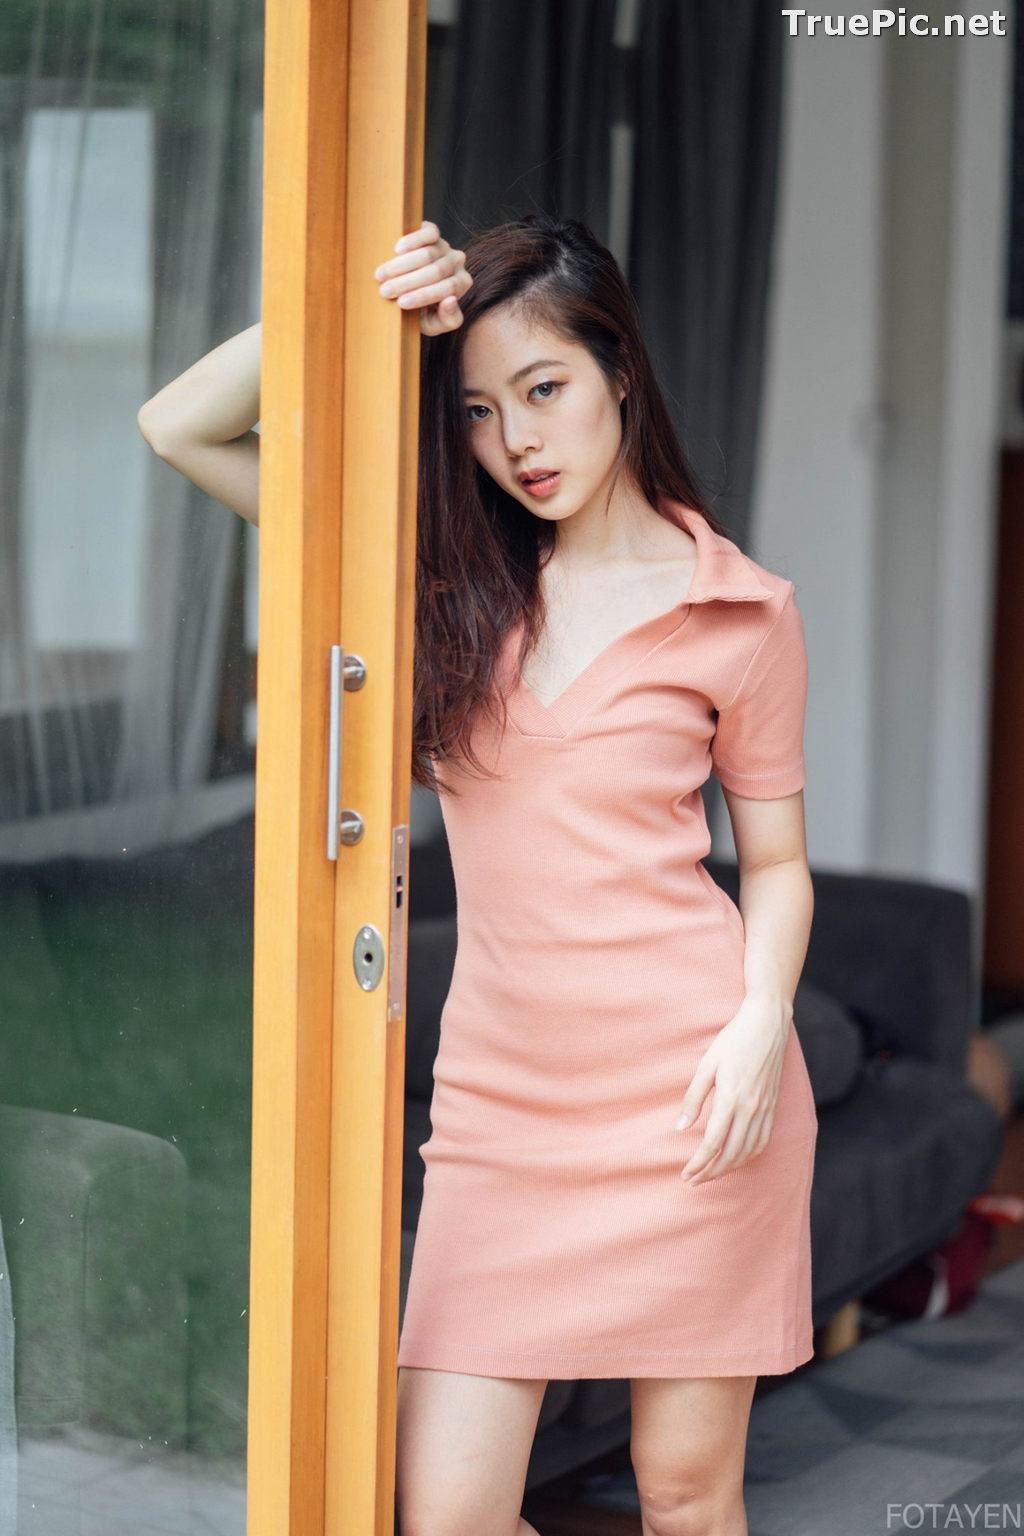 Image Thailand Model - Chanitar Sophawatanon - Pink Lady - TruePic.net - Picture-6